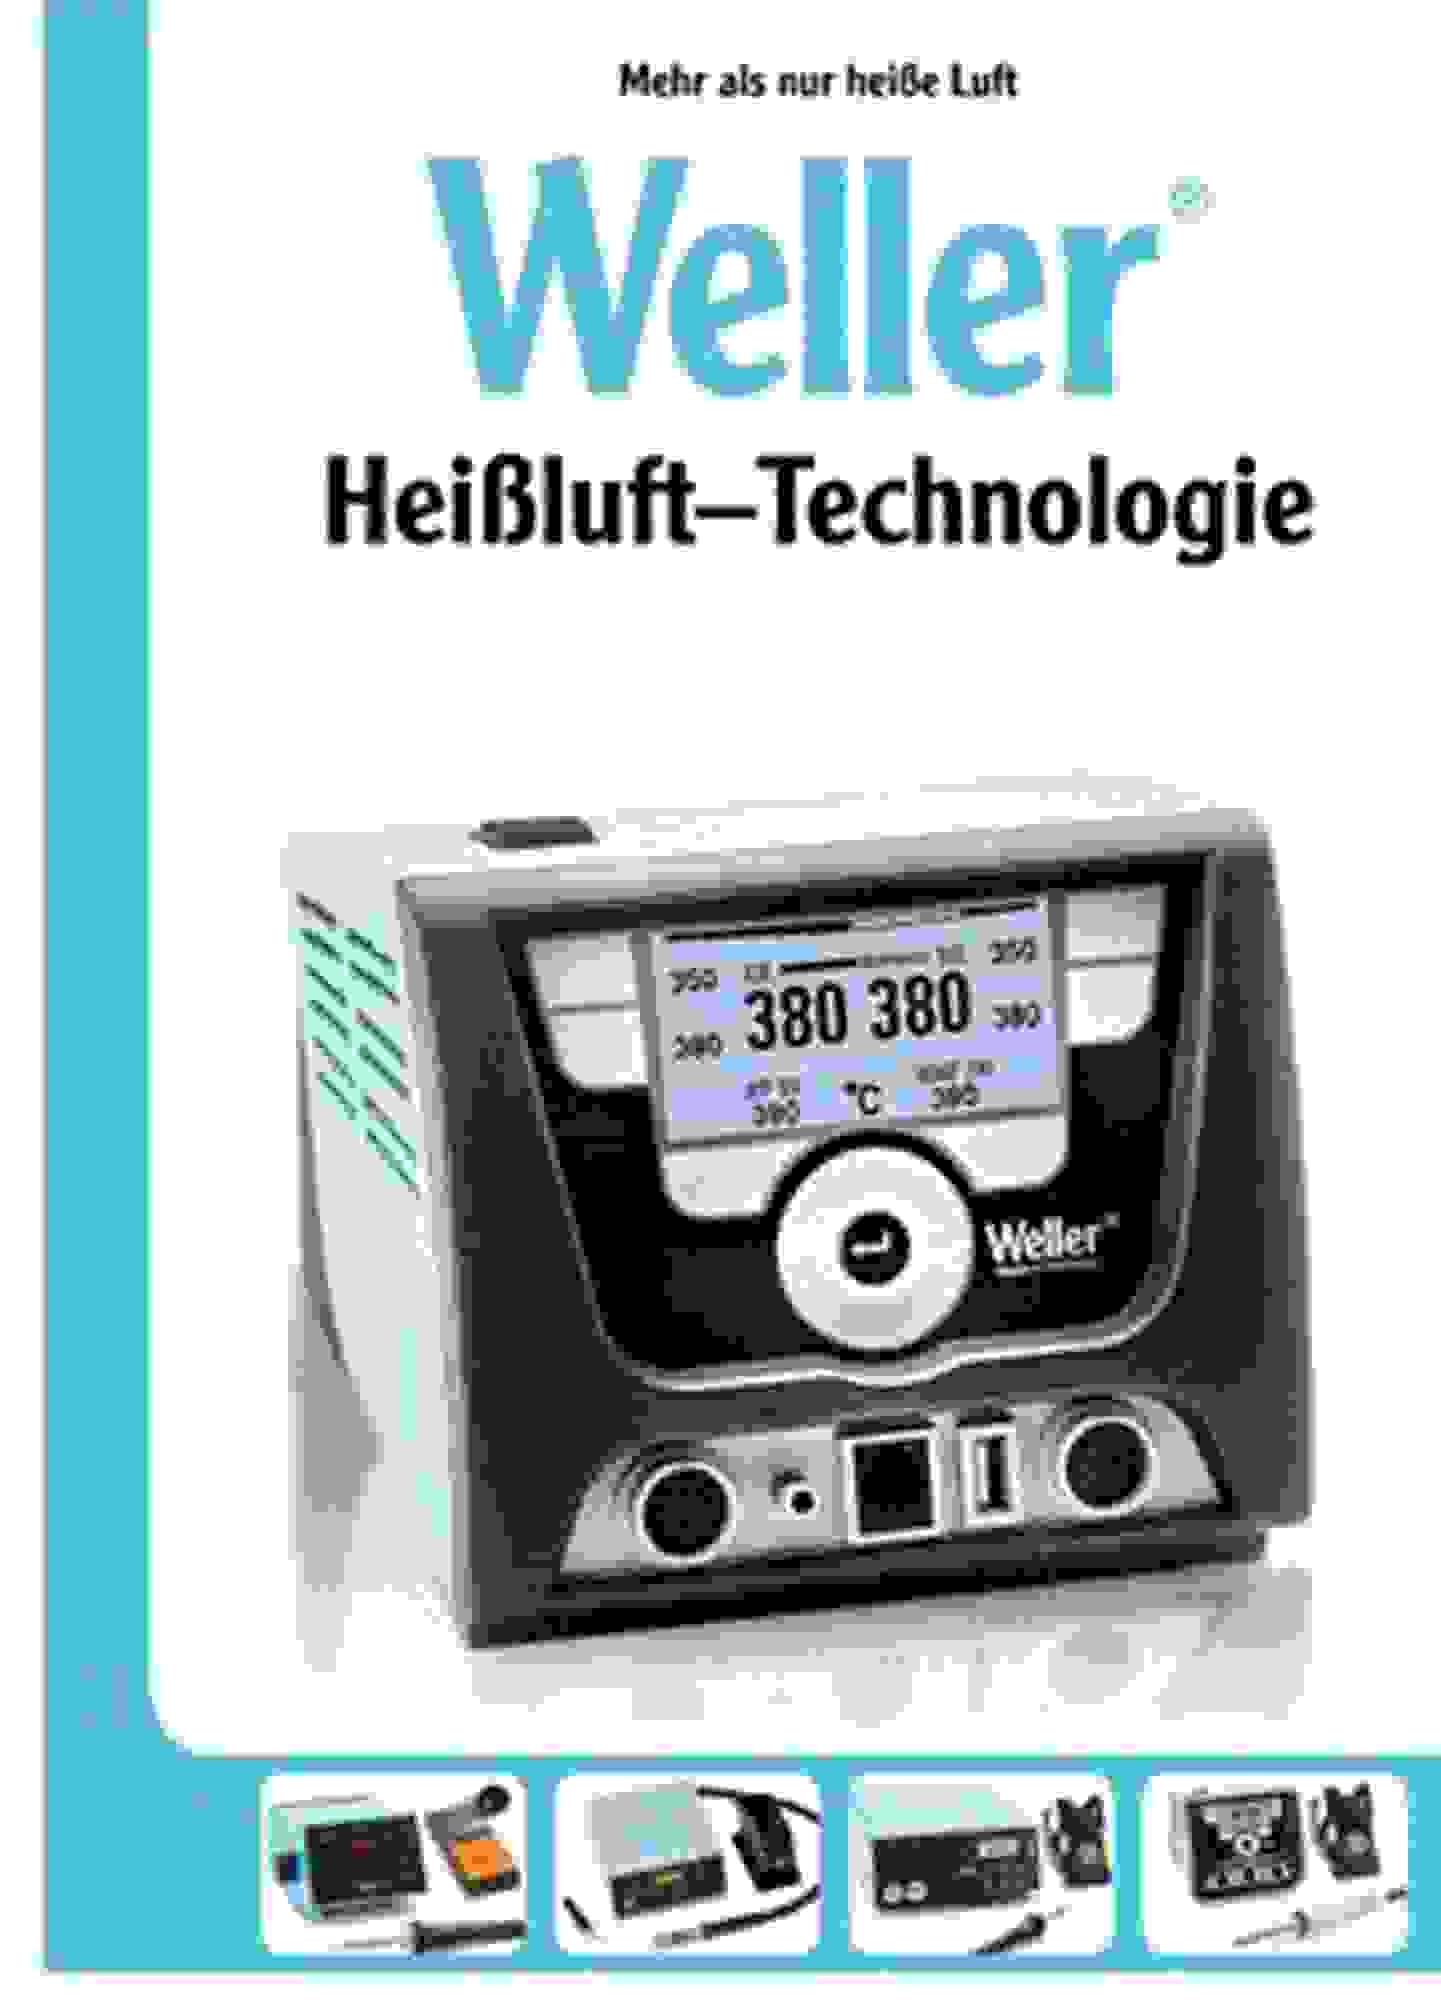 Weller-Heissluft-Technologie